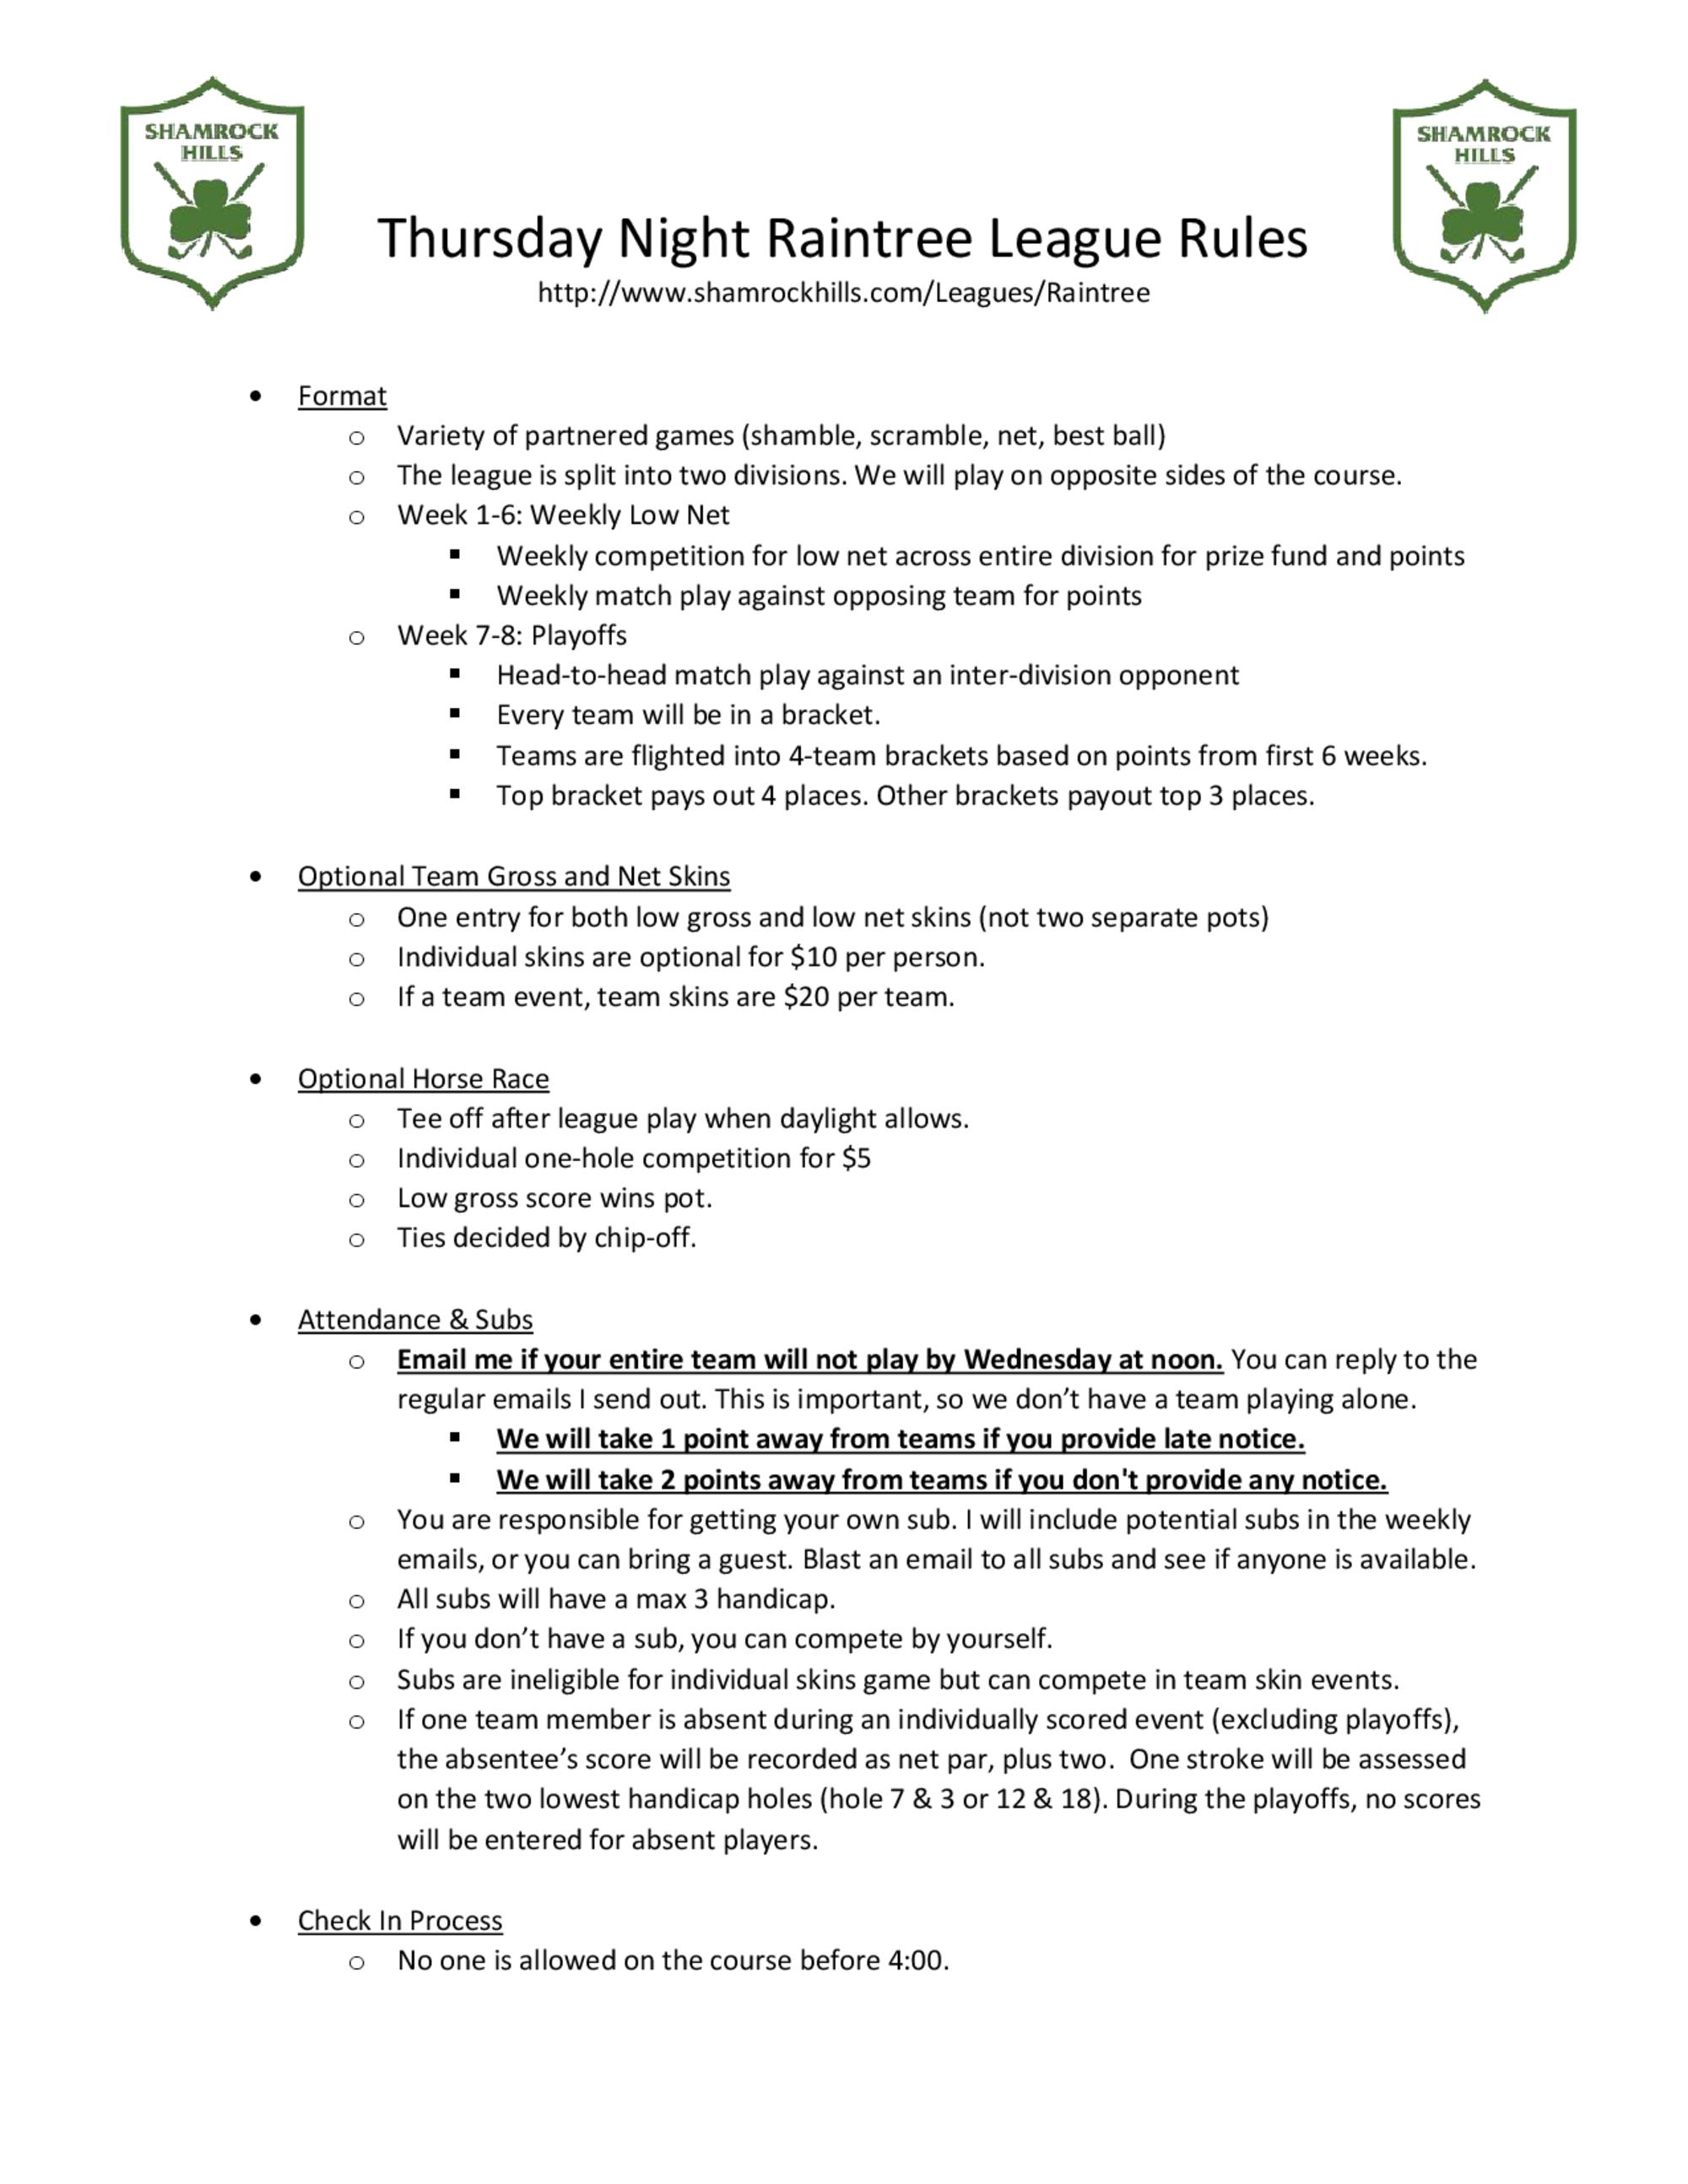 Raintree thursday evening league rules 1